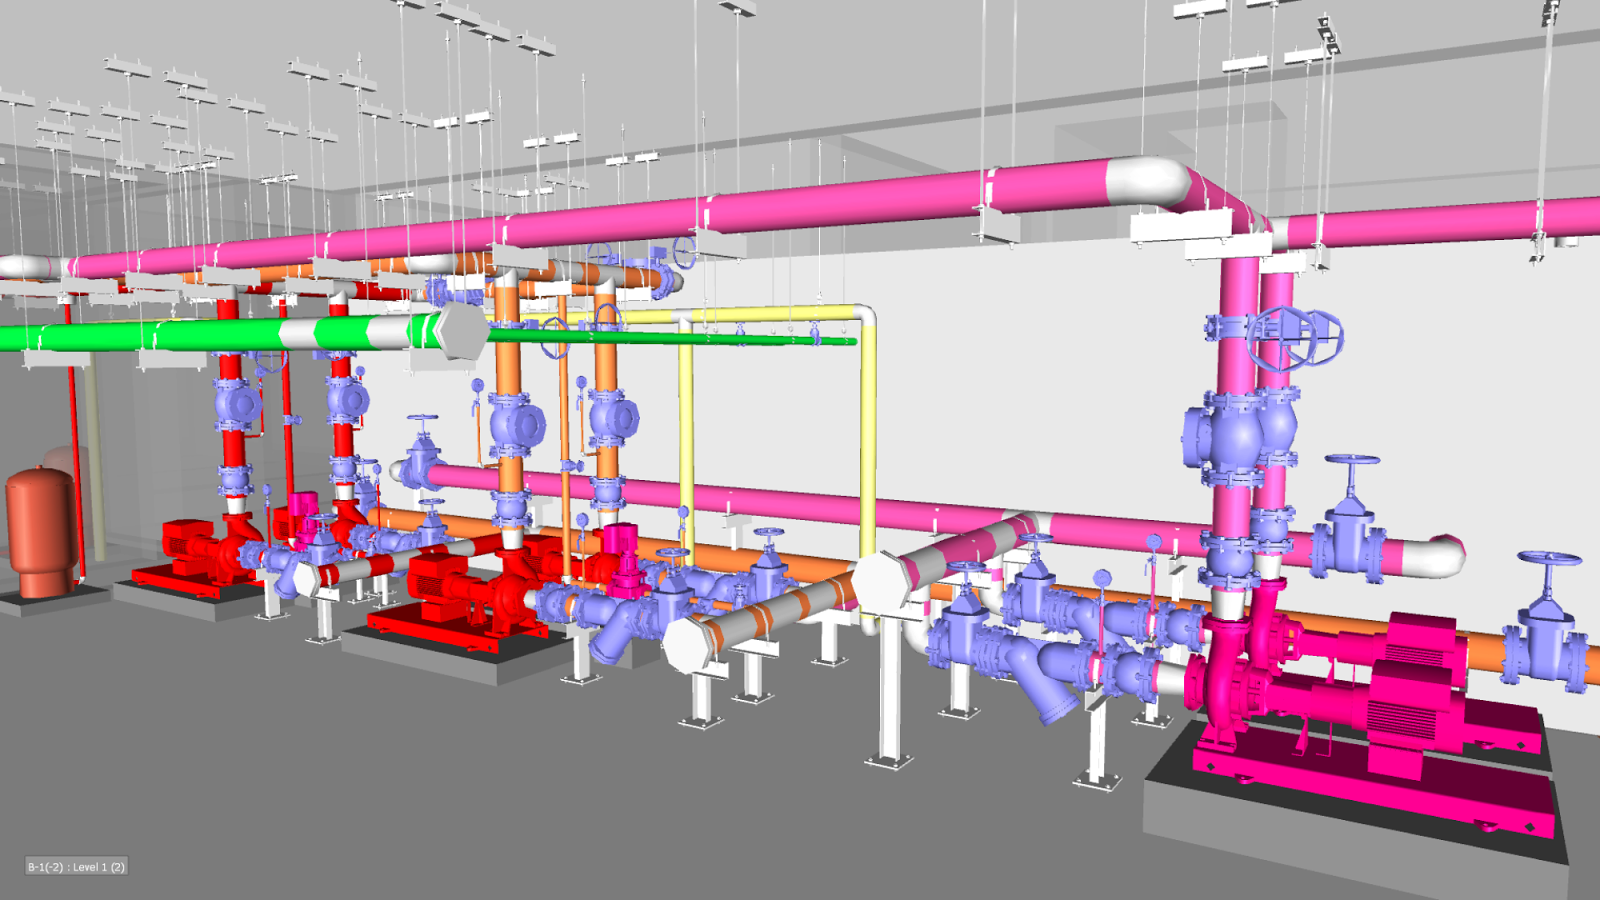 fire pump room autocad layouts  [ 1600 x 900 Pixel ]